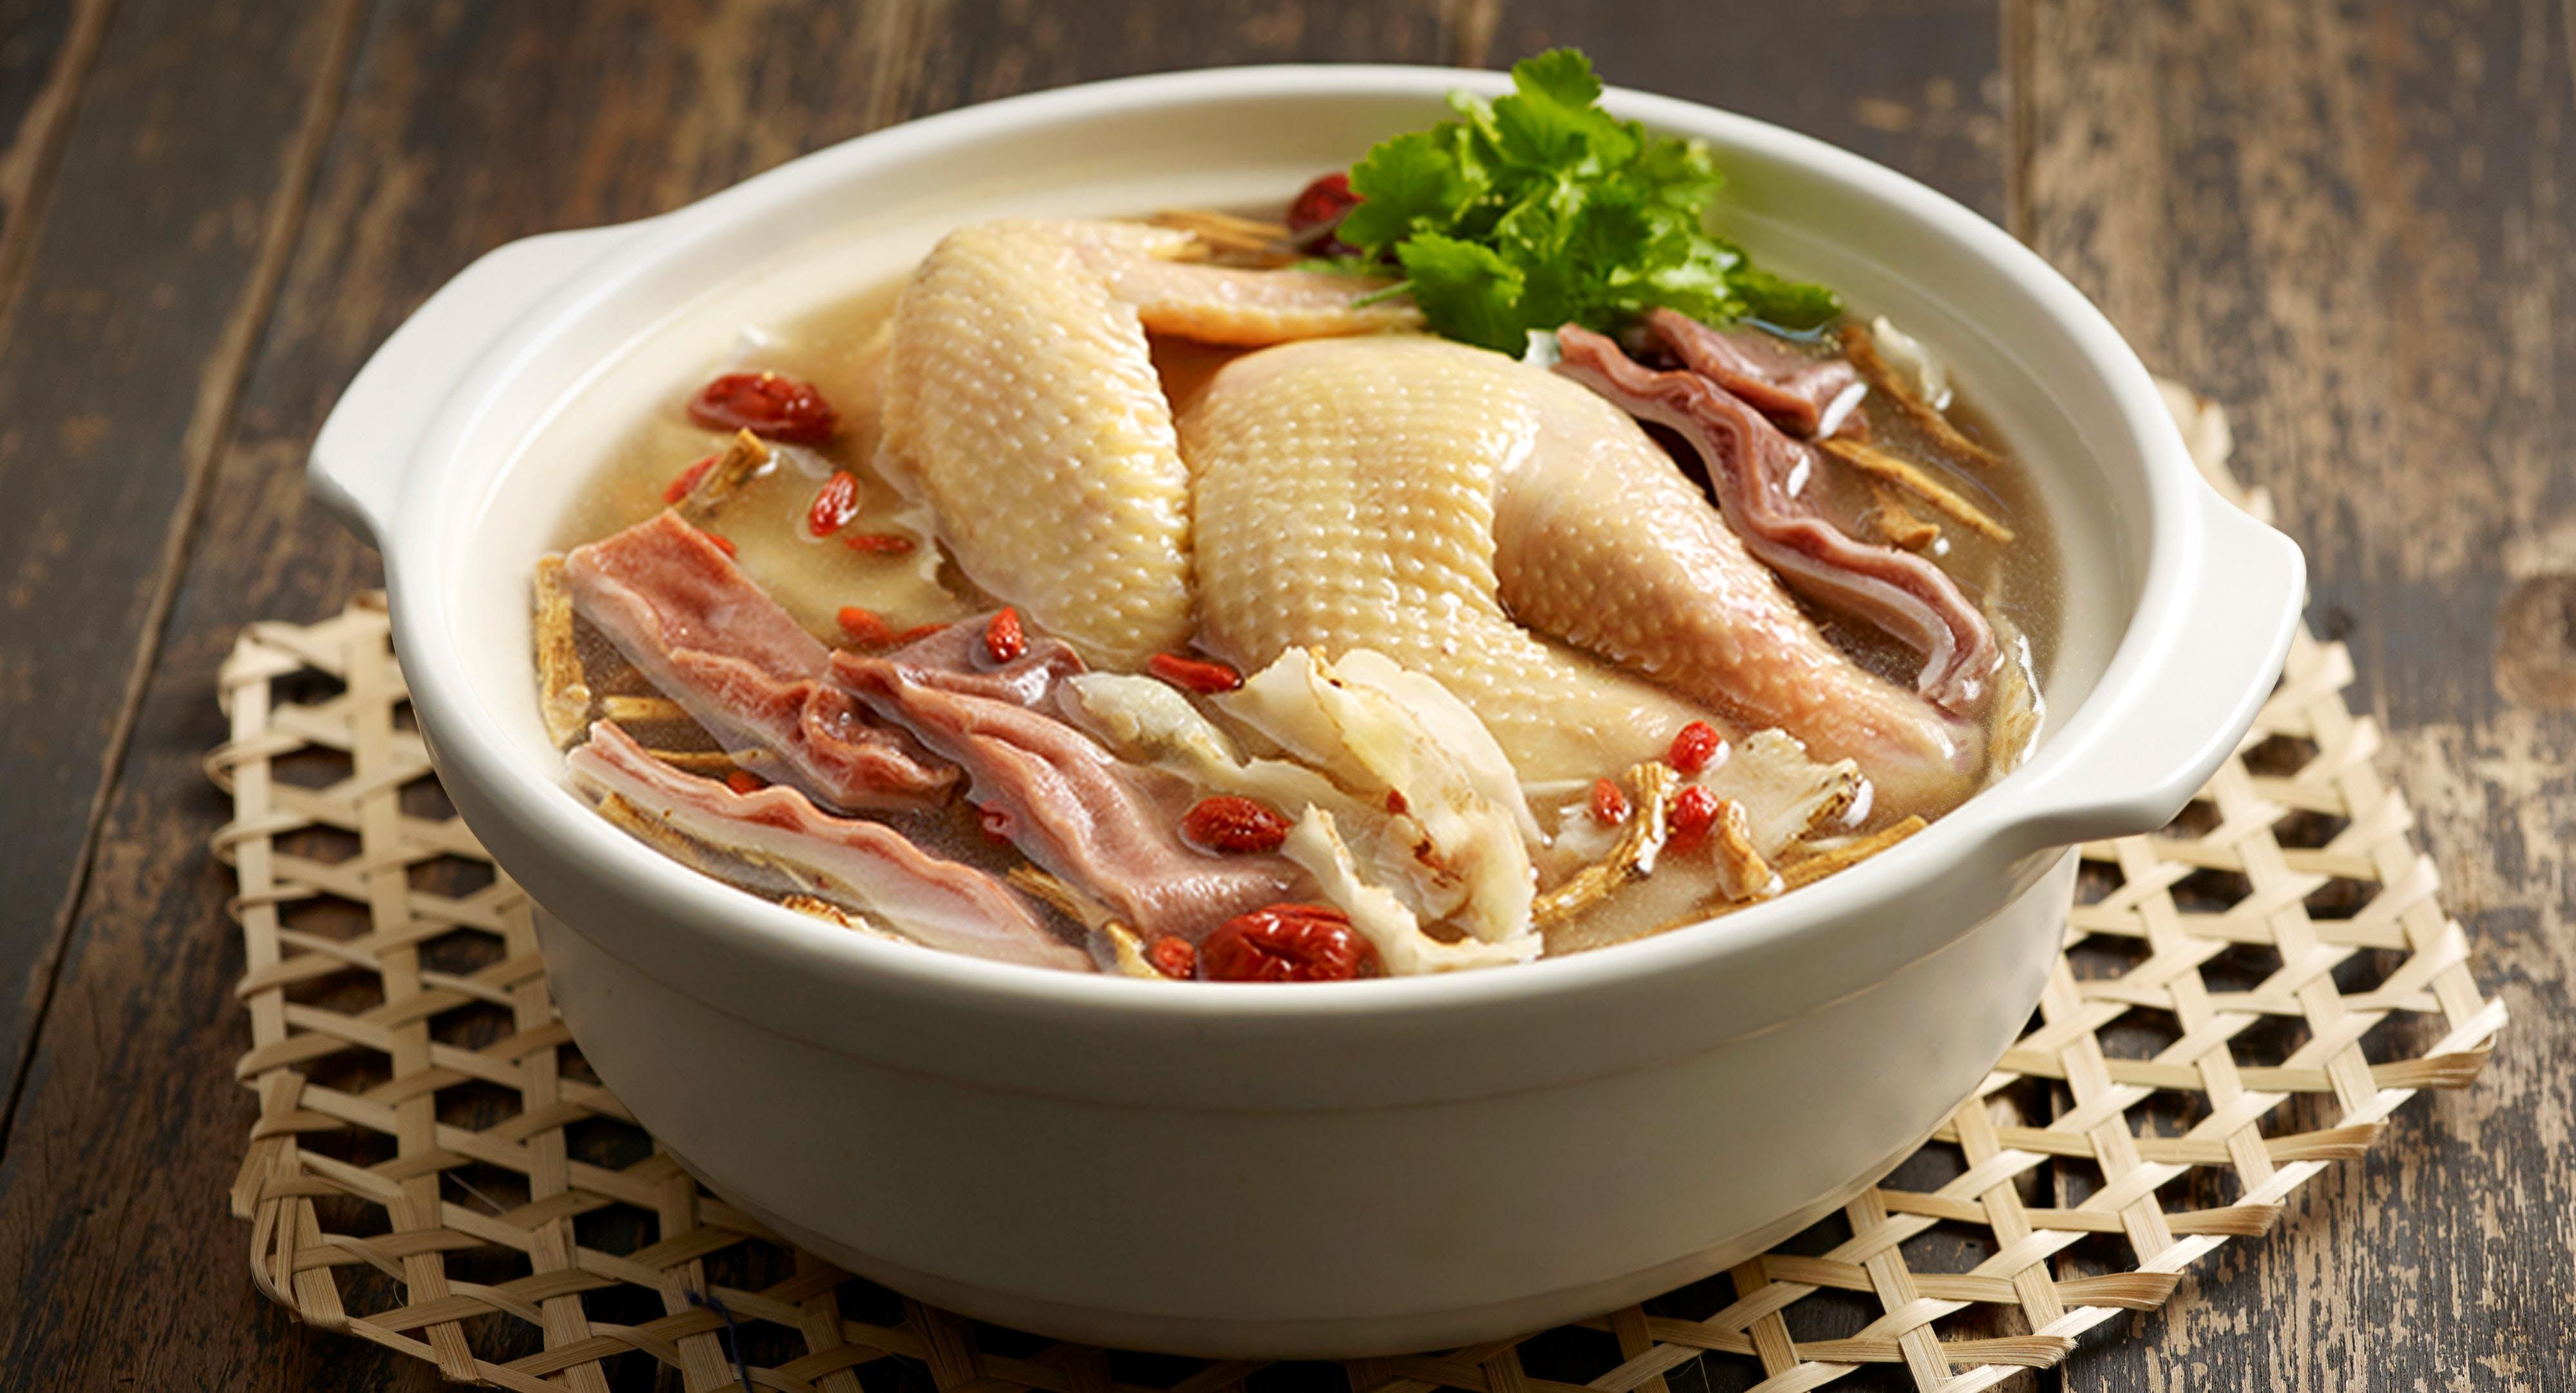 Fat Bird 胖胖鸡 - Liang Seah